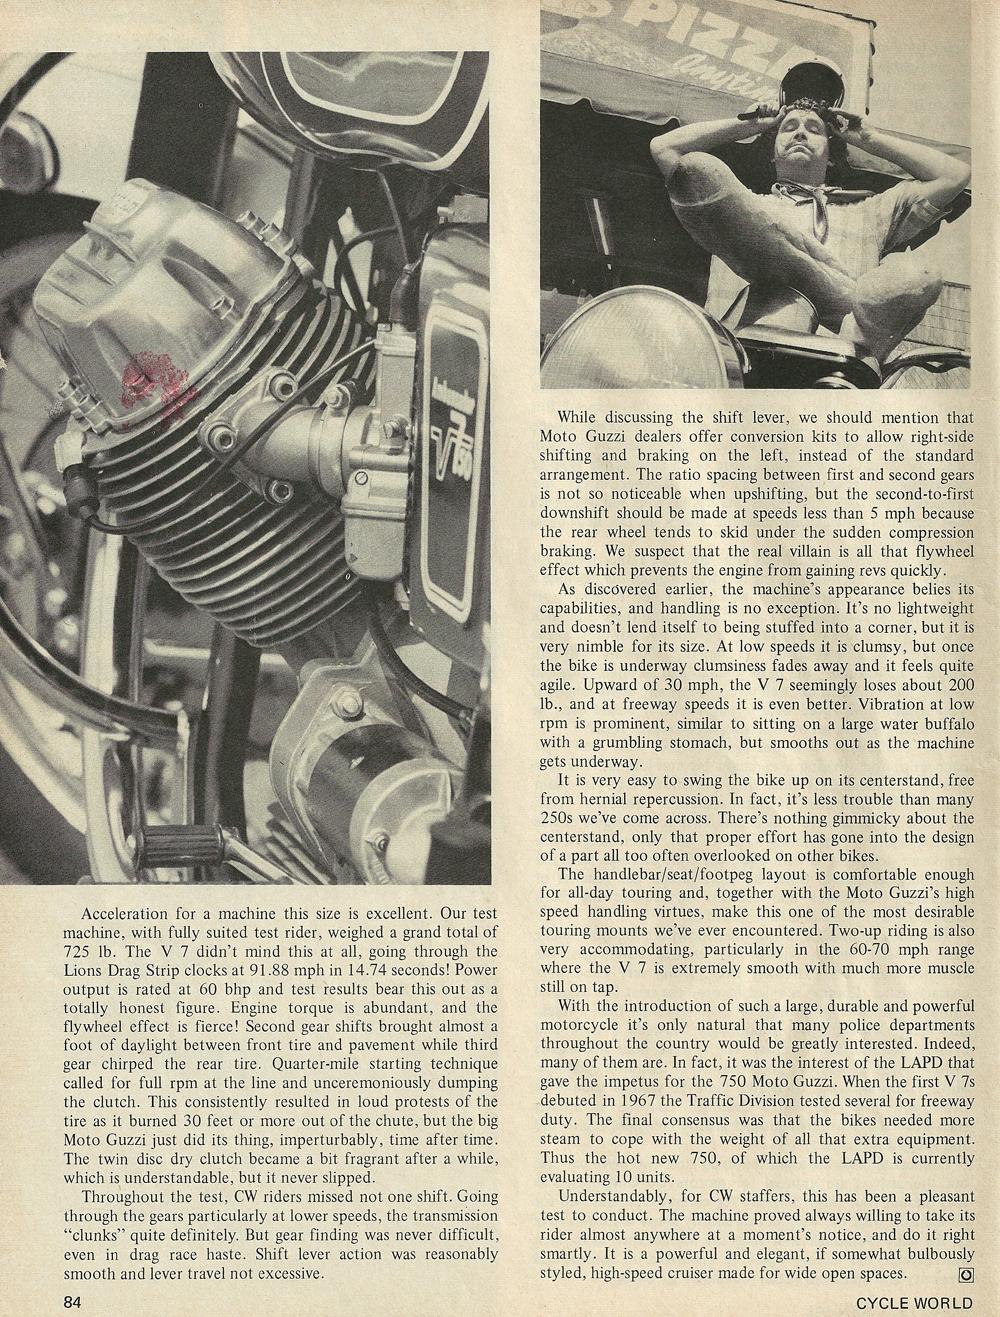 1969 Moto Guzzi 750 Ambassador road test 4.jpg